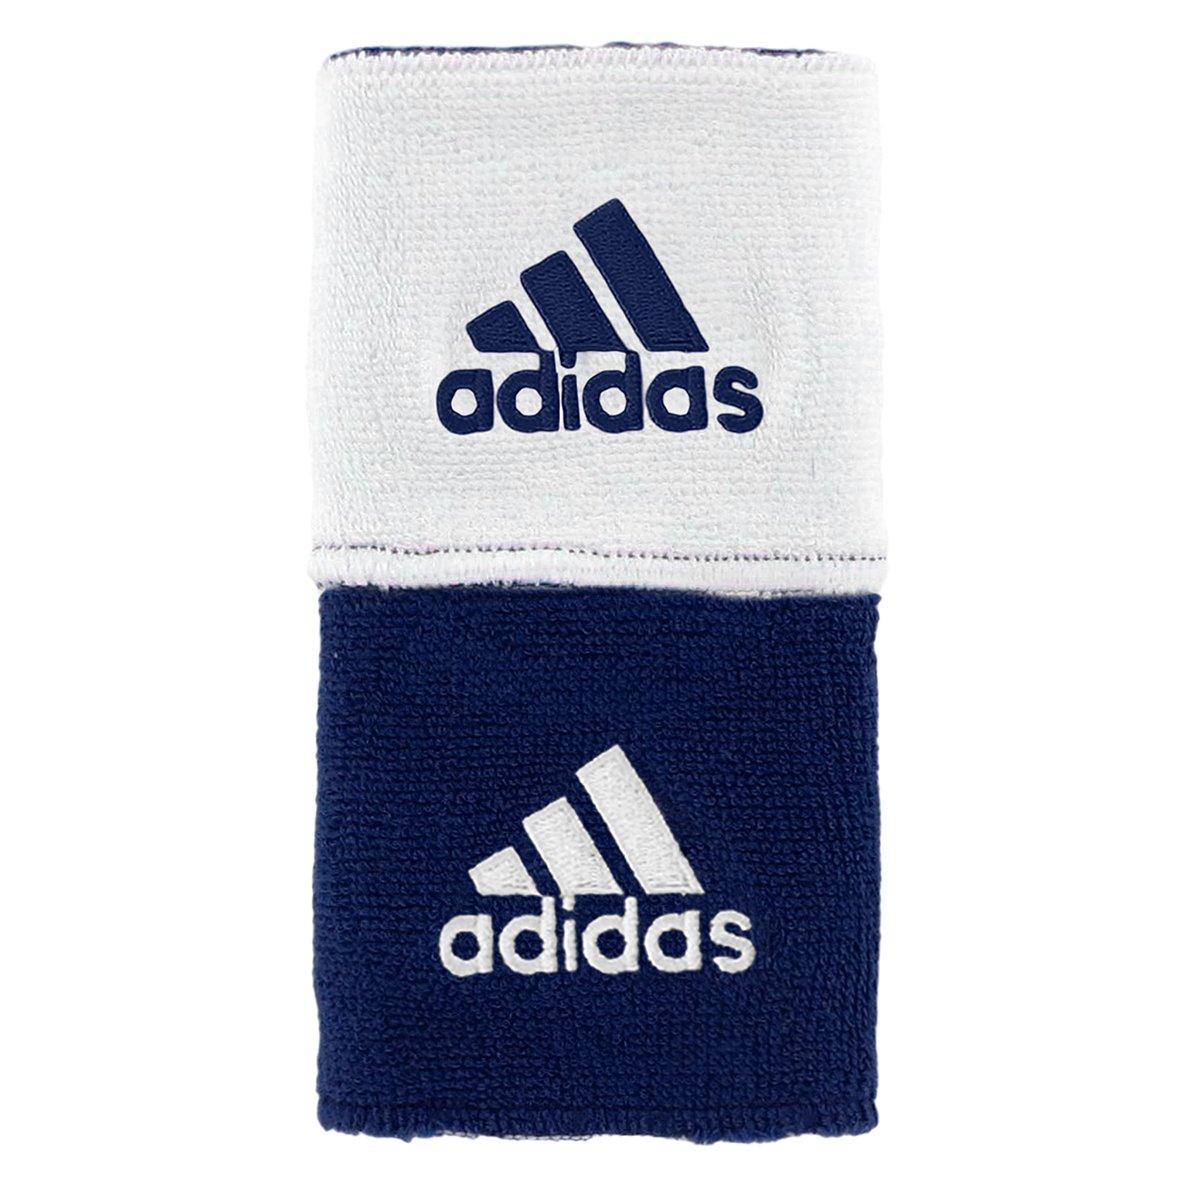 adidas Men's Interval Reversible Wristband 5133997